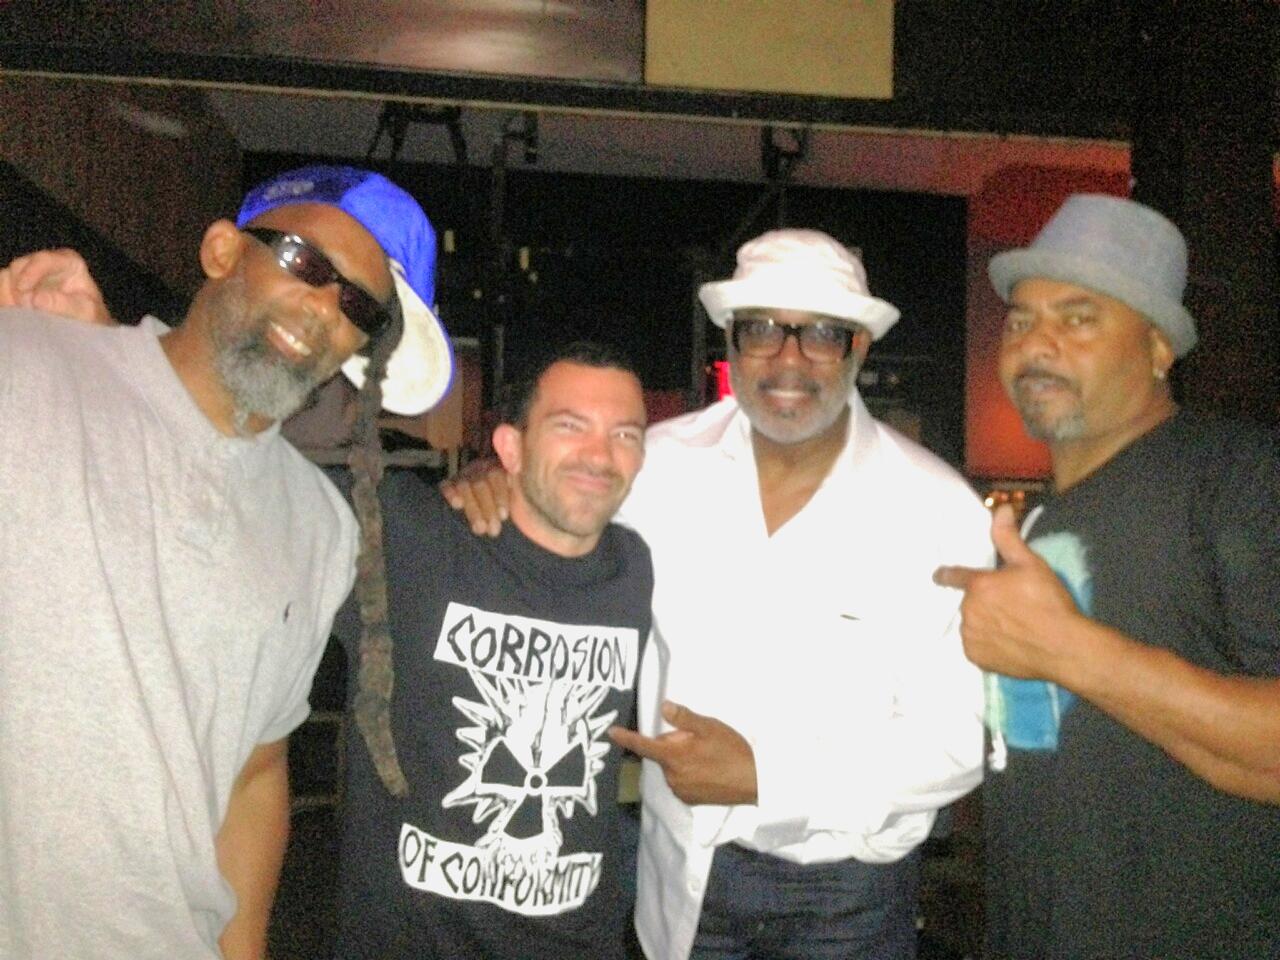 Norwood Fisher, Peyote Cody, Harvey Mason, & John 'Wet Daddy' Steward. Venice 2014.